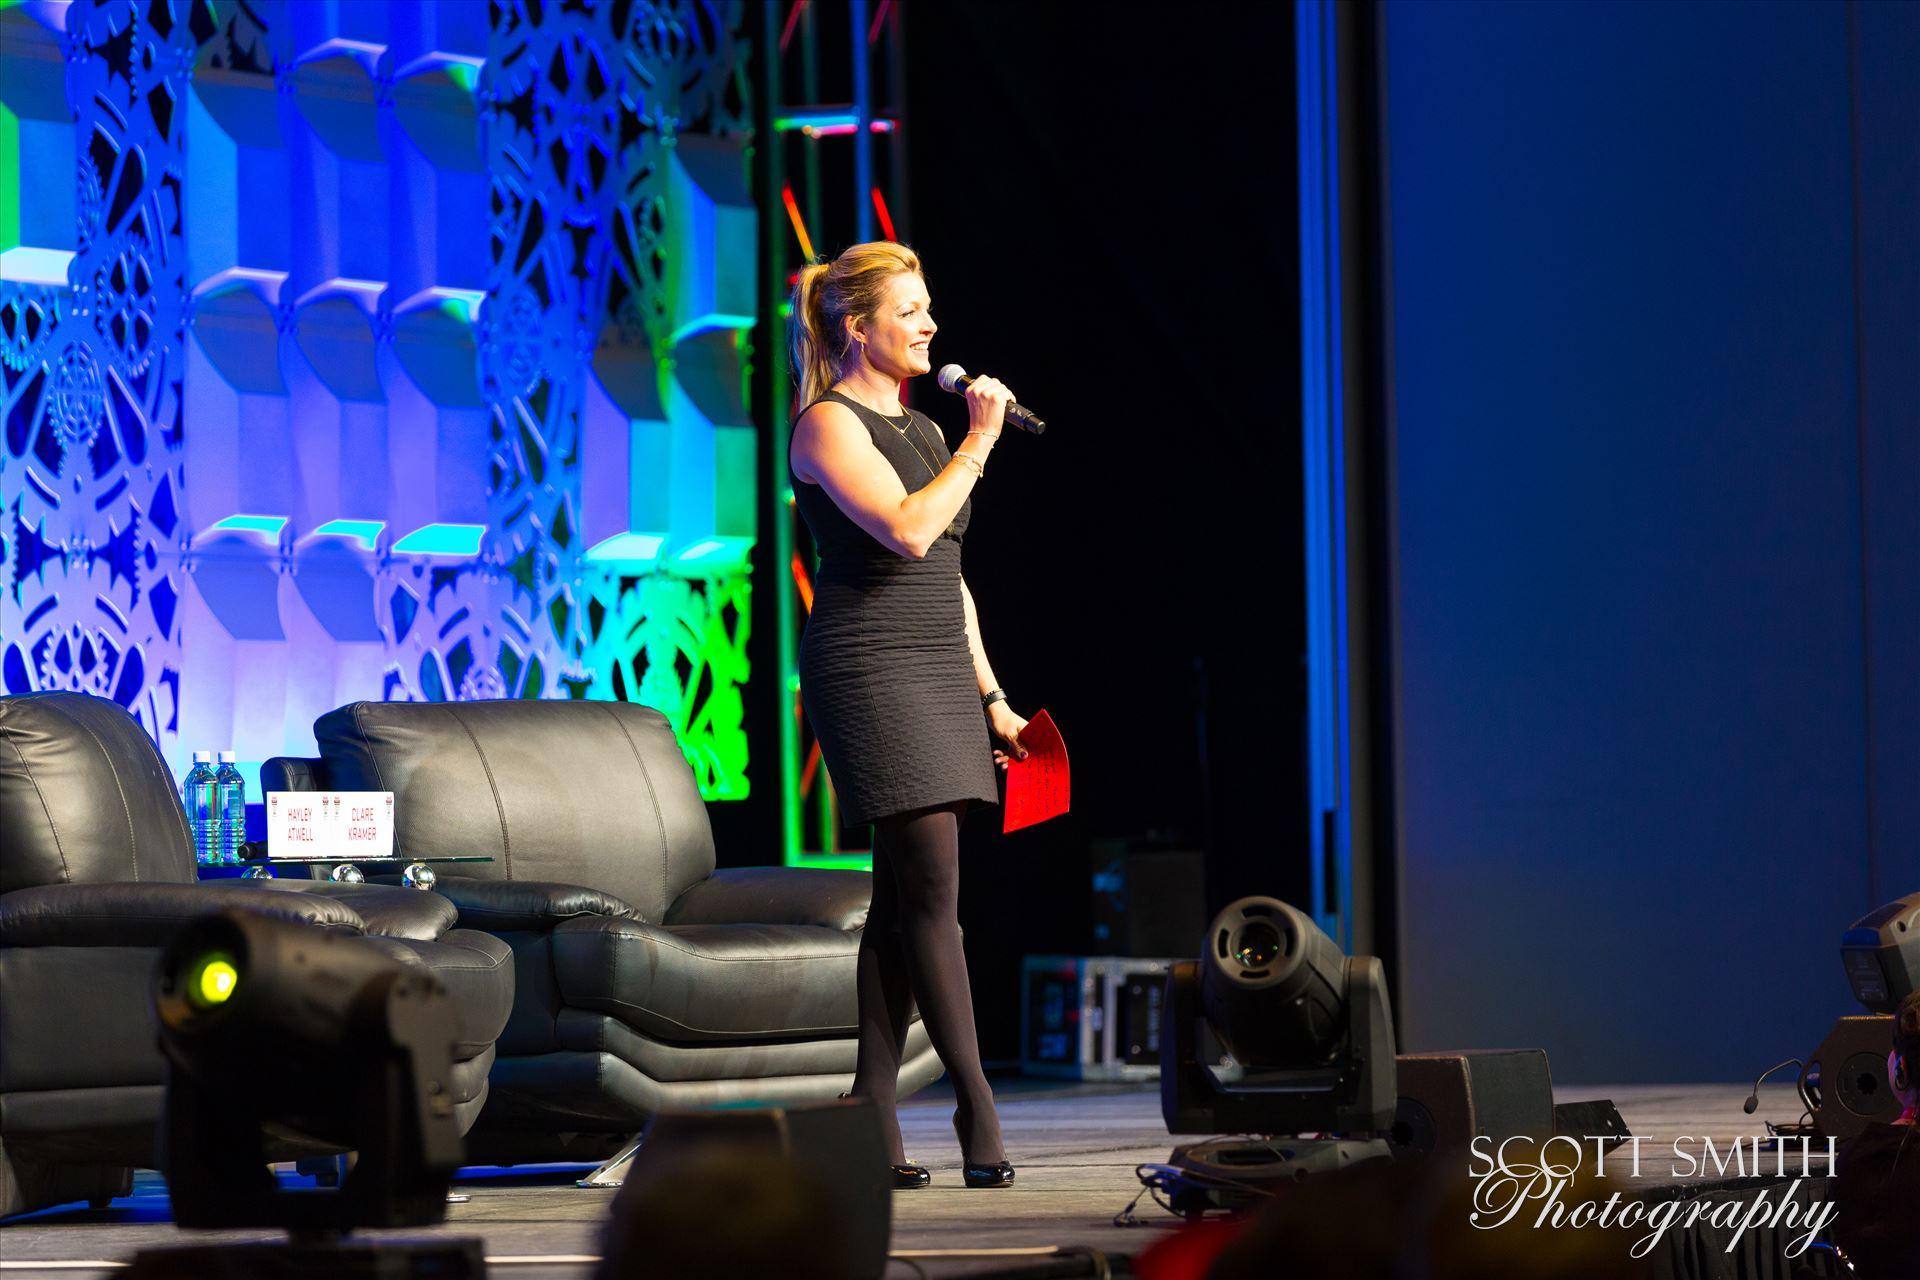 Denver Comic Con 2016 15 - Denver Comic Con 2016 at the Colorado Convention Center. Clare Kramer. by D Scott Smith